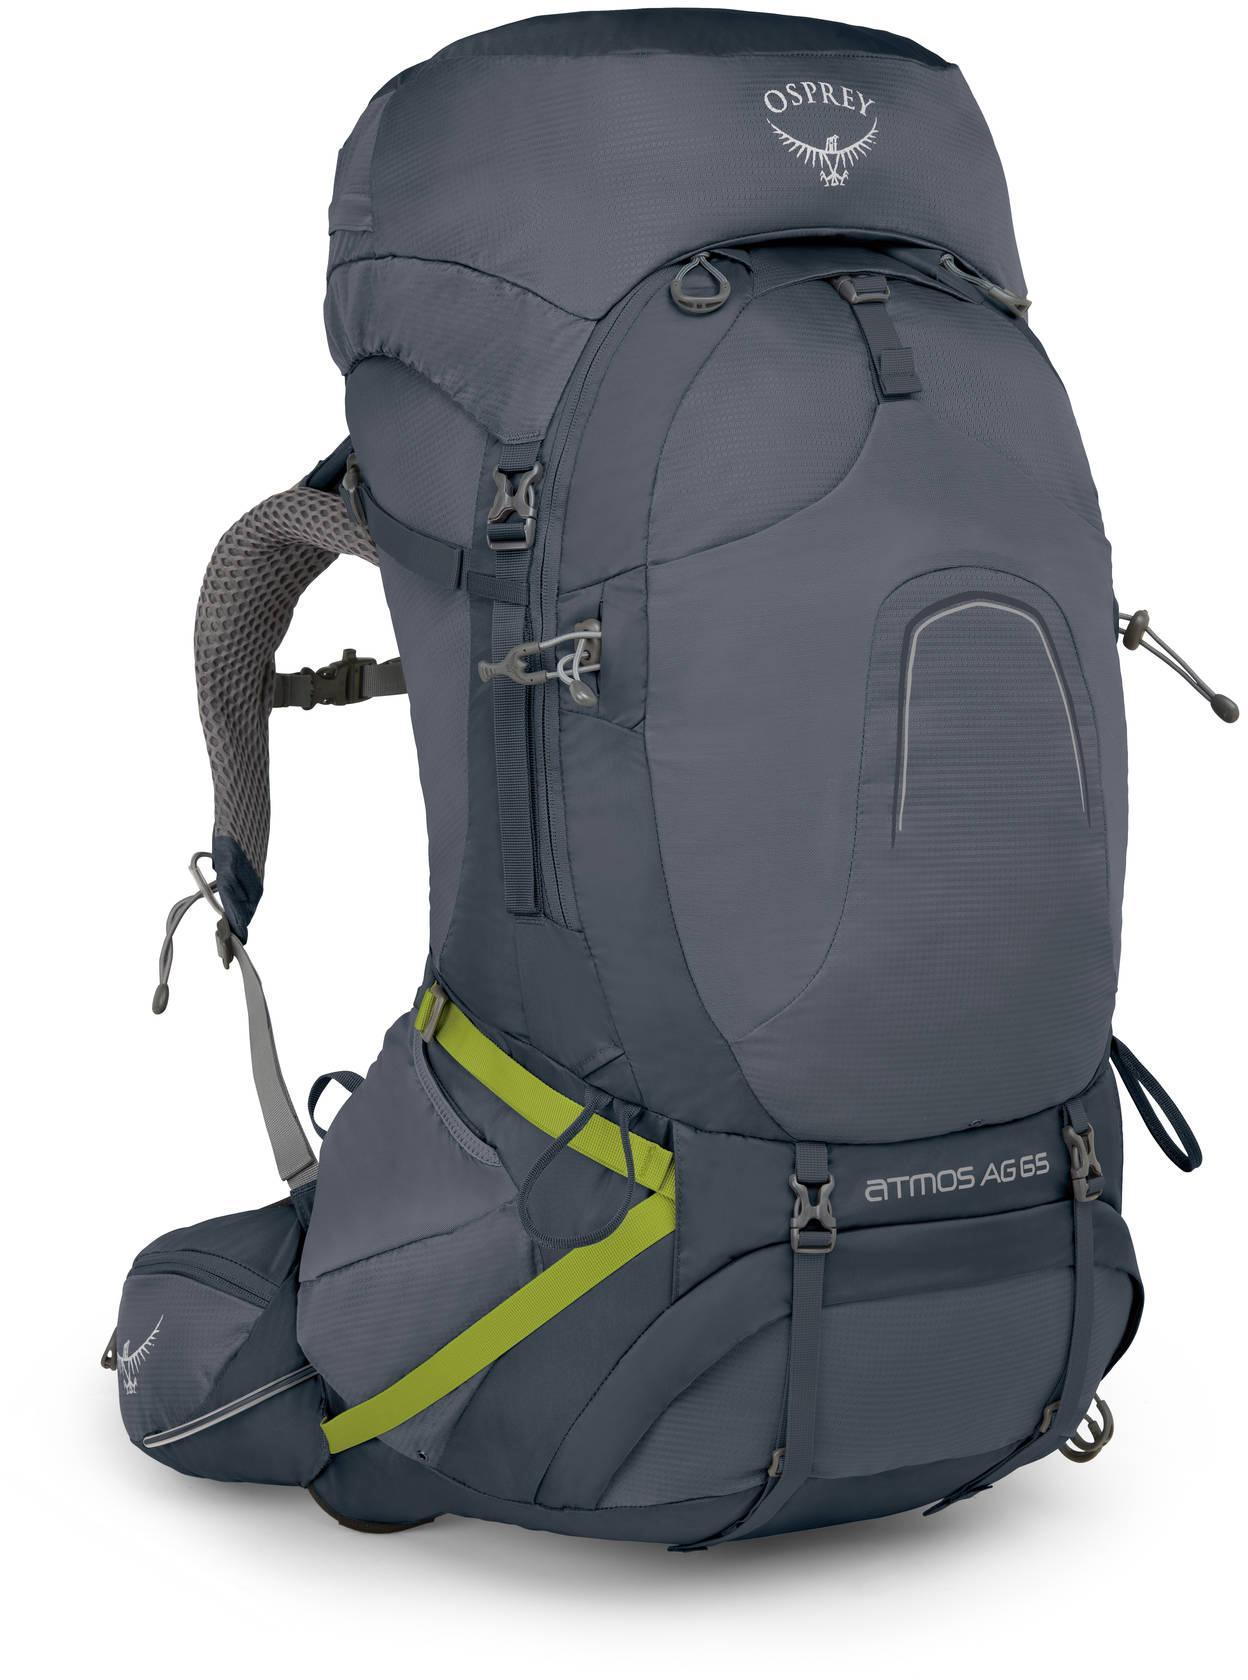 Туристические рюкзаки Рюкзак Osprey Atmos AG 65 Abyss Grey Atmos_AG_65_S18_Side_Abyss_Grey_web.jpg